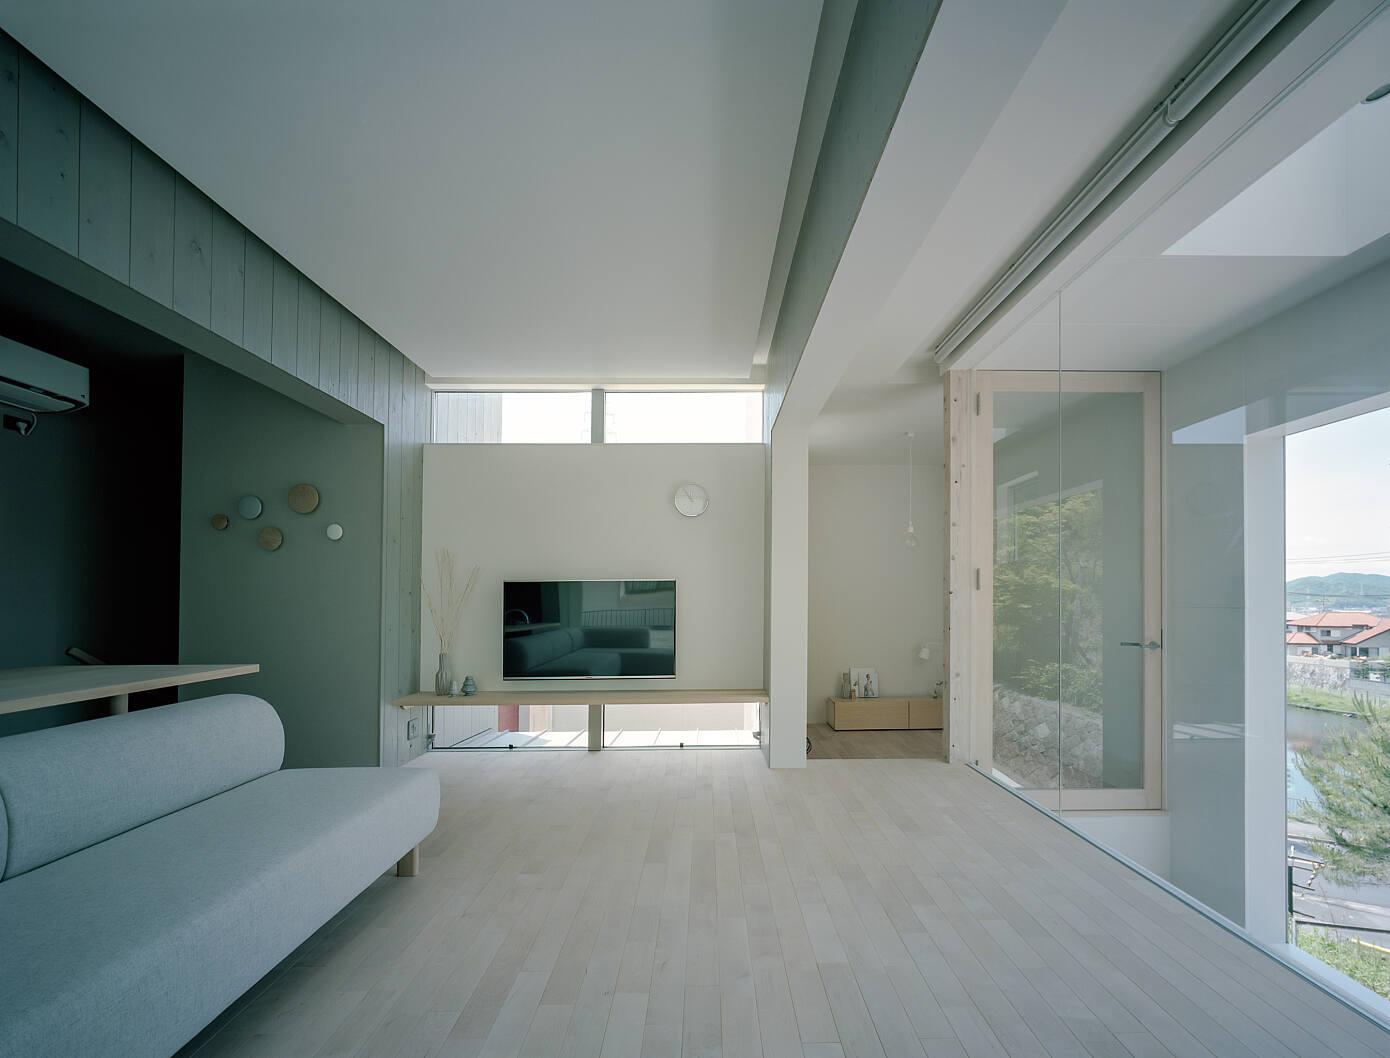 House in Himeji by Fujiwaramuro Architects